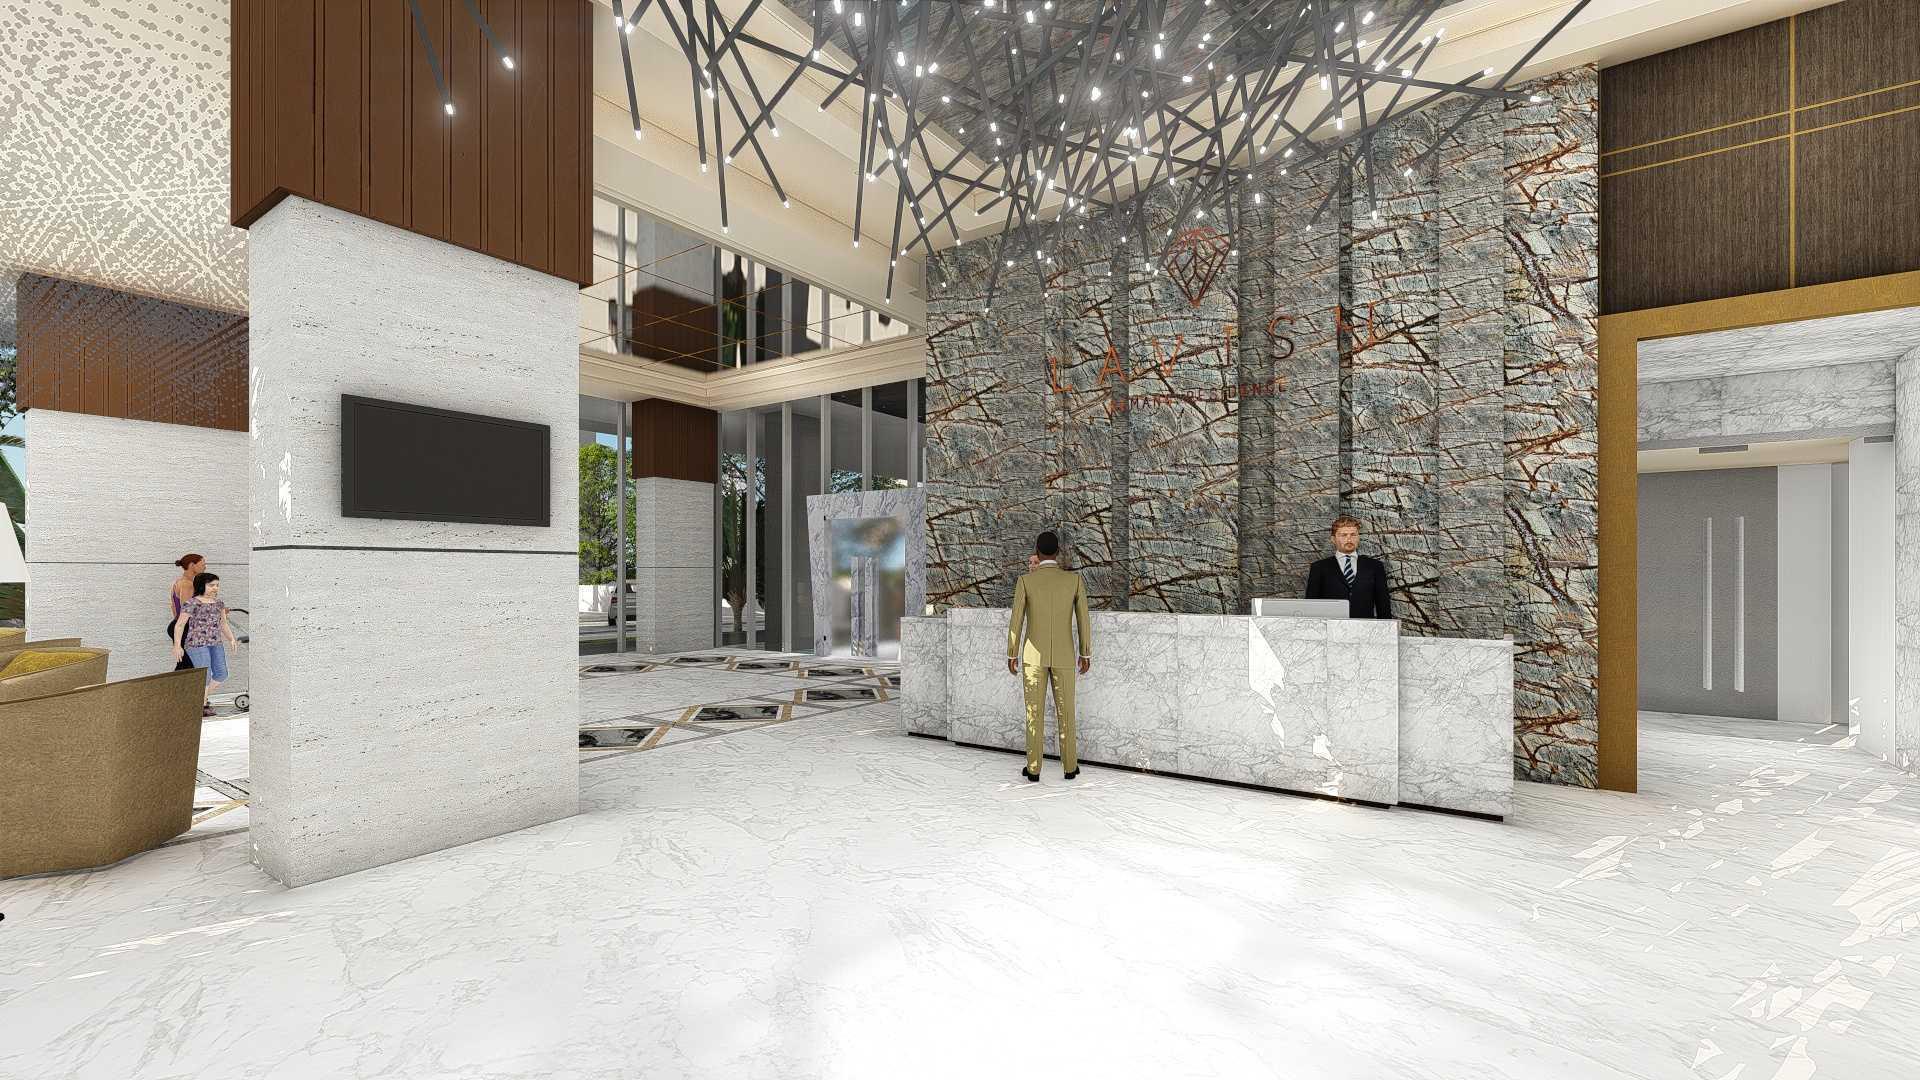 Samitrayasa Design Luxury Design Alternative 2 Jl. Kemang Raya, Bangka, Mampang Prpt., Kota Jakarta Selatan, Daerah Khusus Ibukota Jakarta, Indonesia  103 Modern  32651